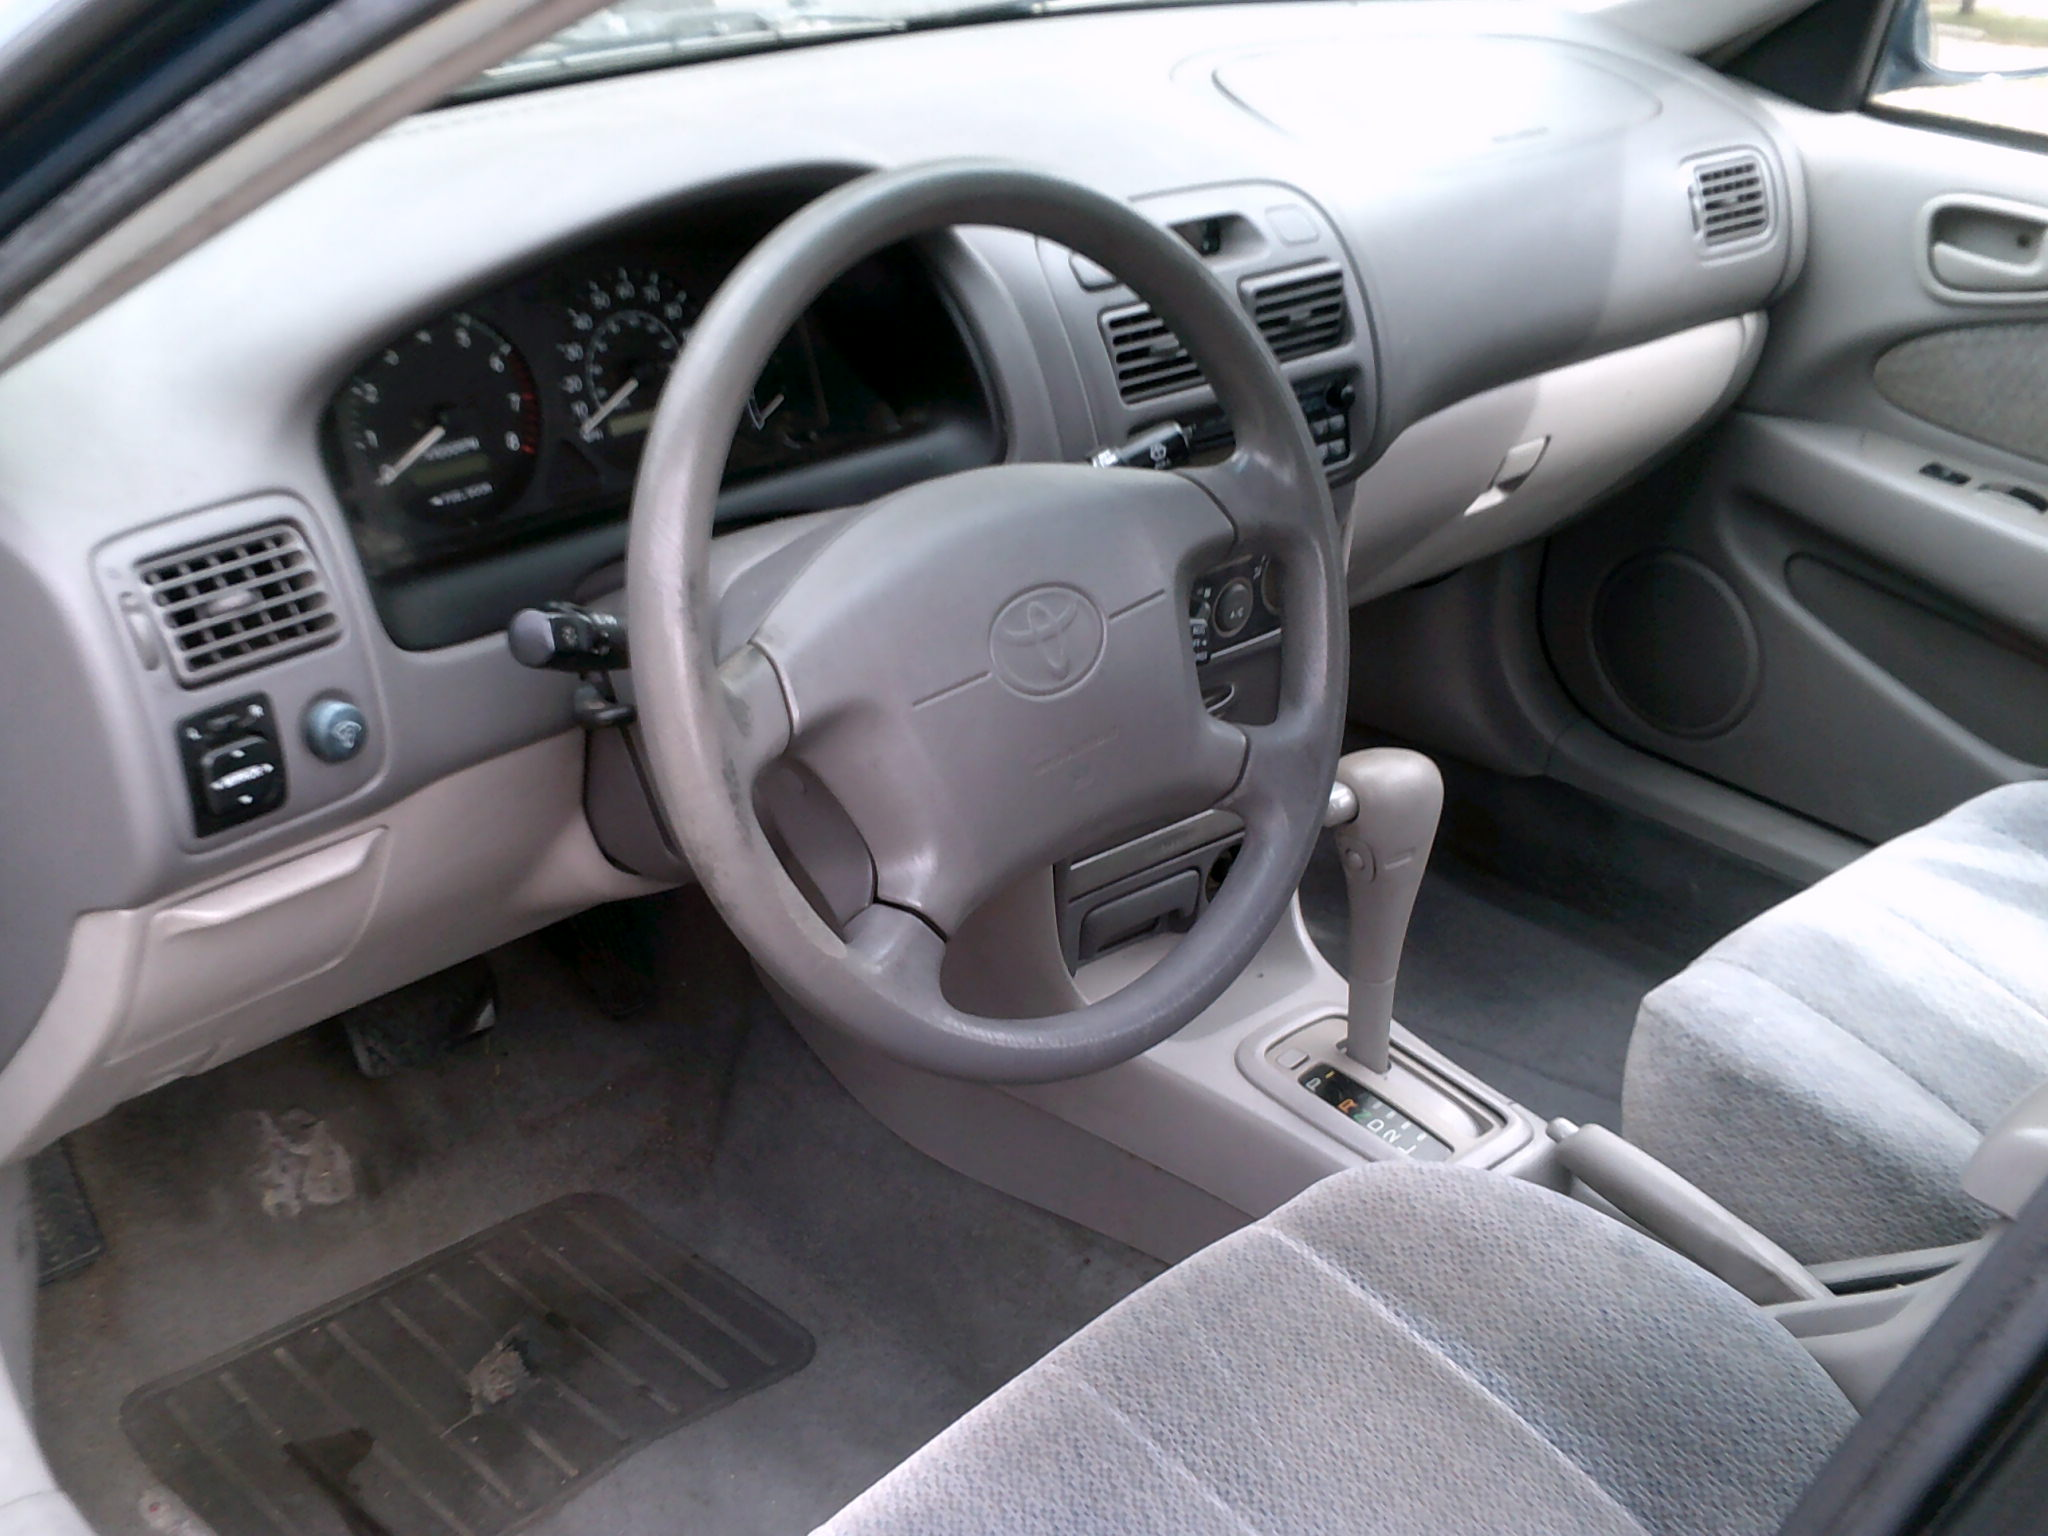 Toyota Corolla 2001 Autos Post